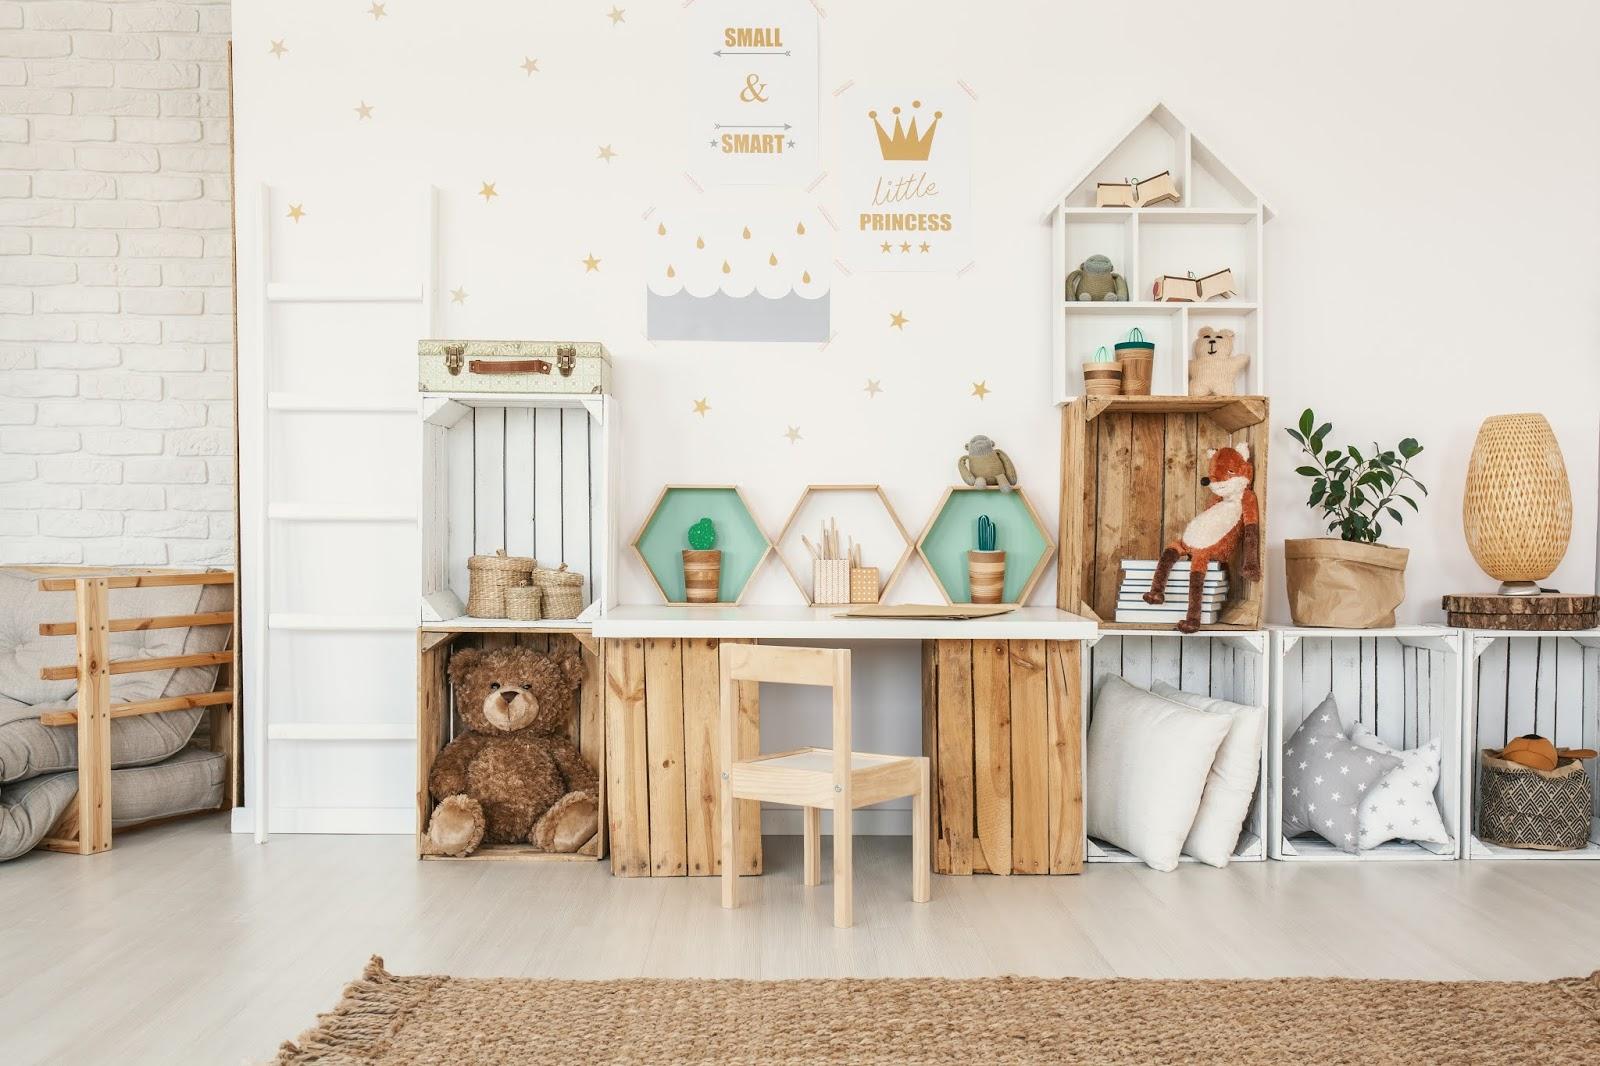 Dormitorio infantil con estanterías realizadas con cajas de fruta pintadas